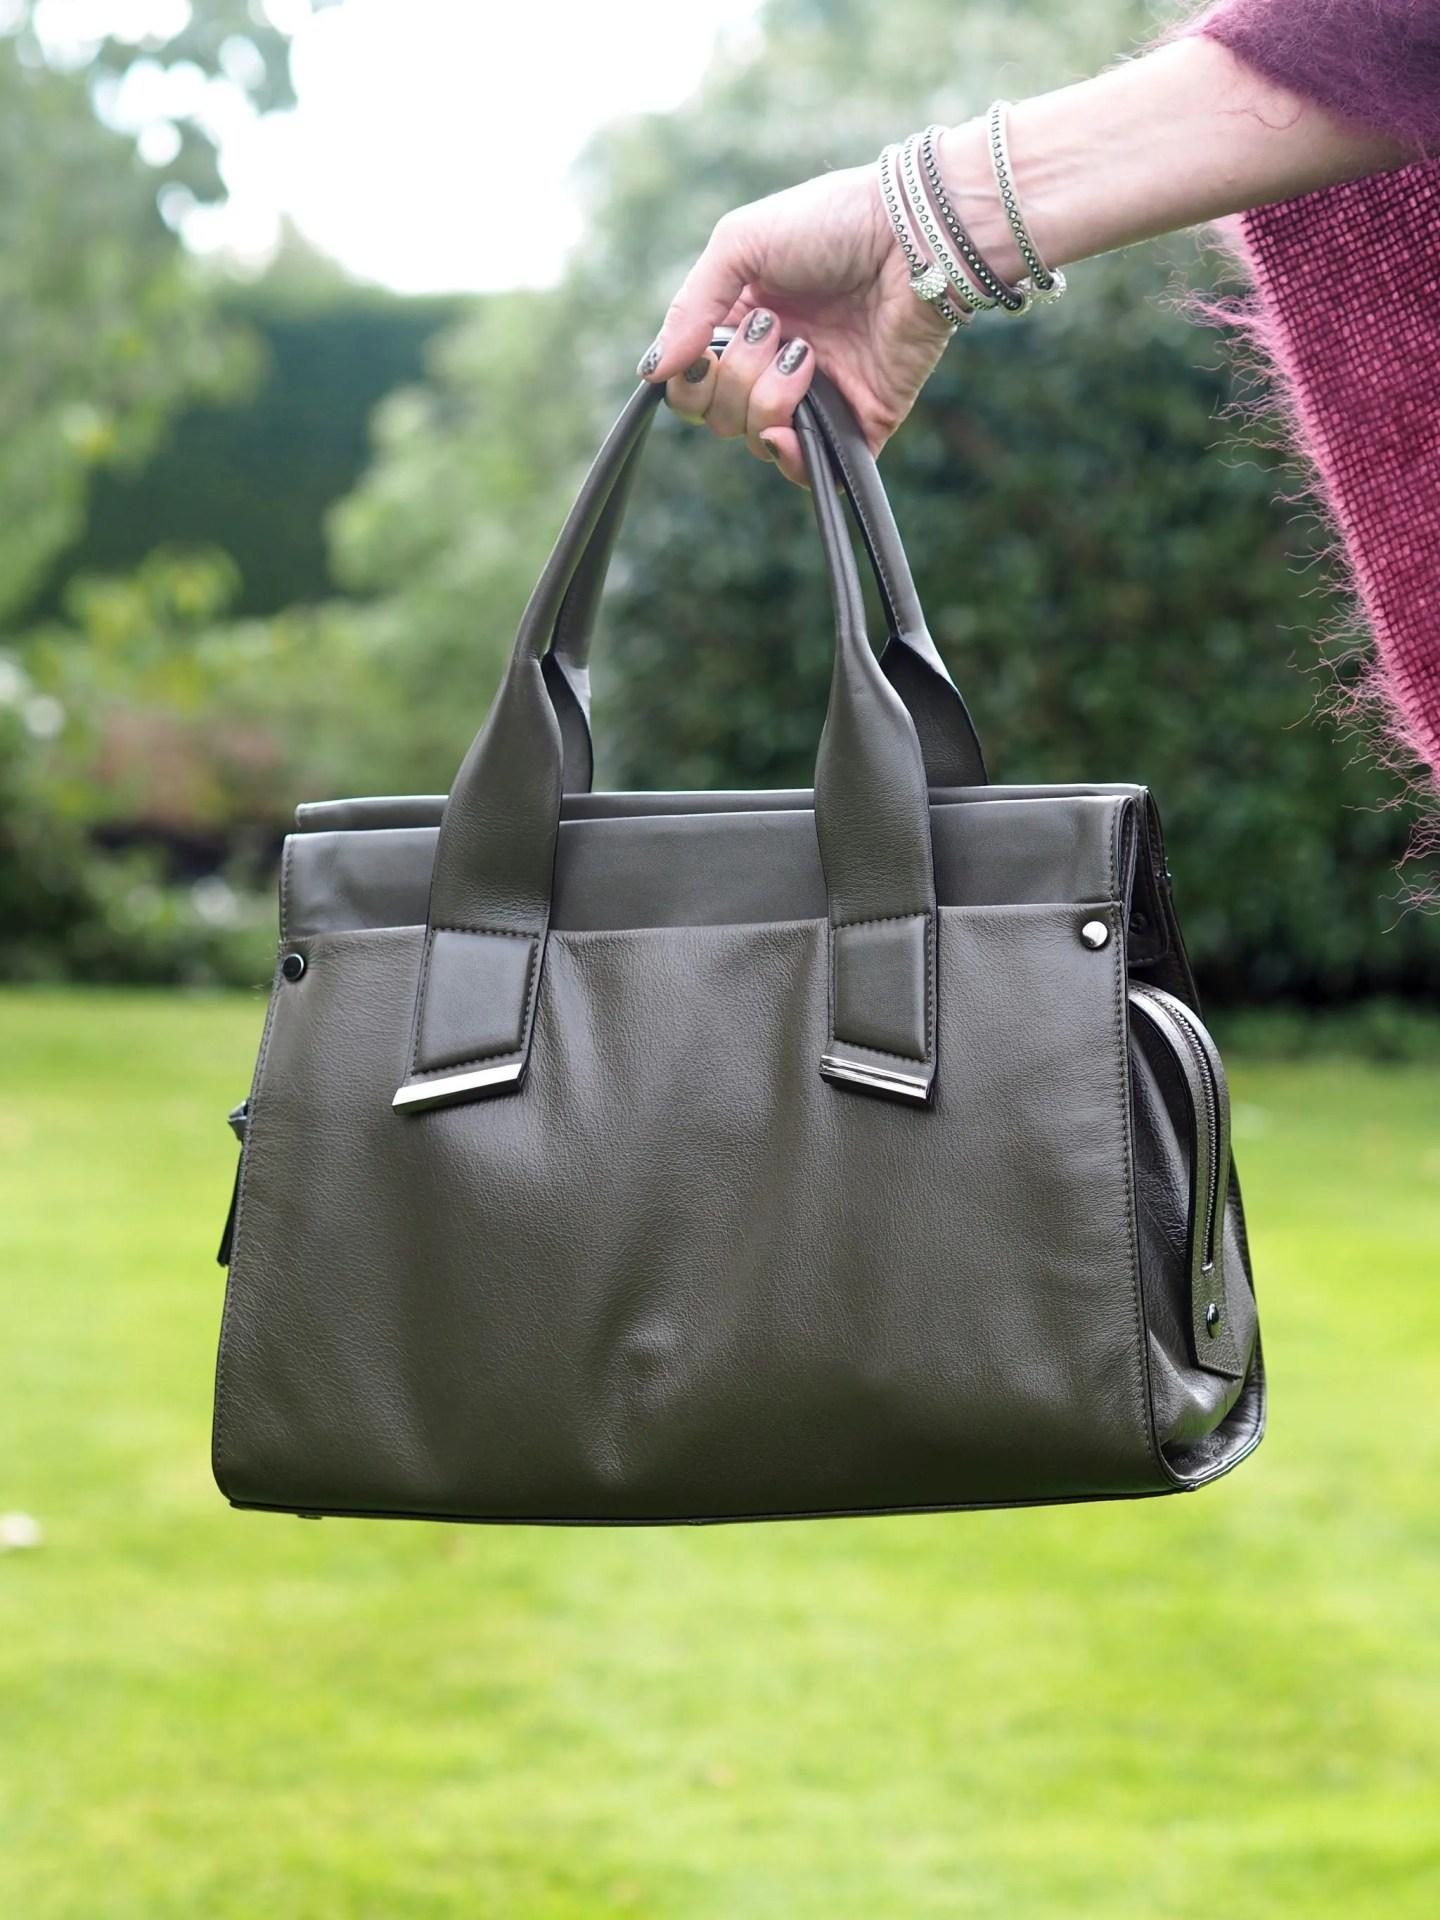 what-lizzy-loves-khaki-tunic-dress-autumn-style-leather-handbag-label-lab